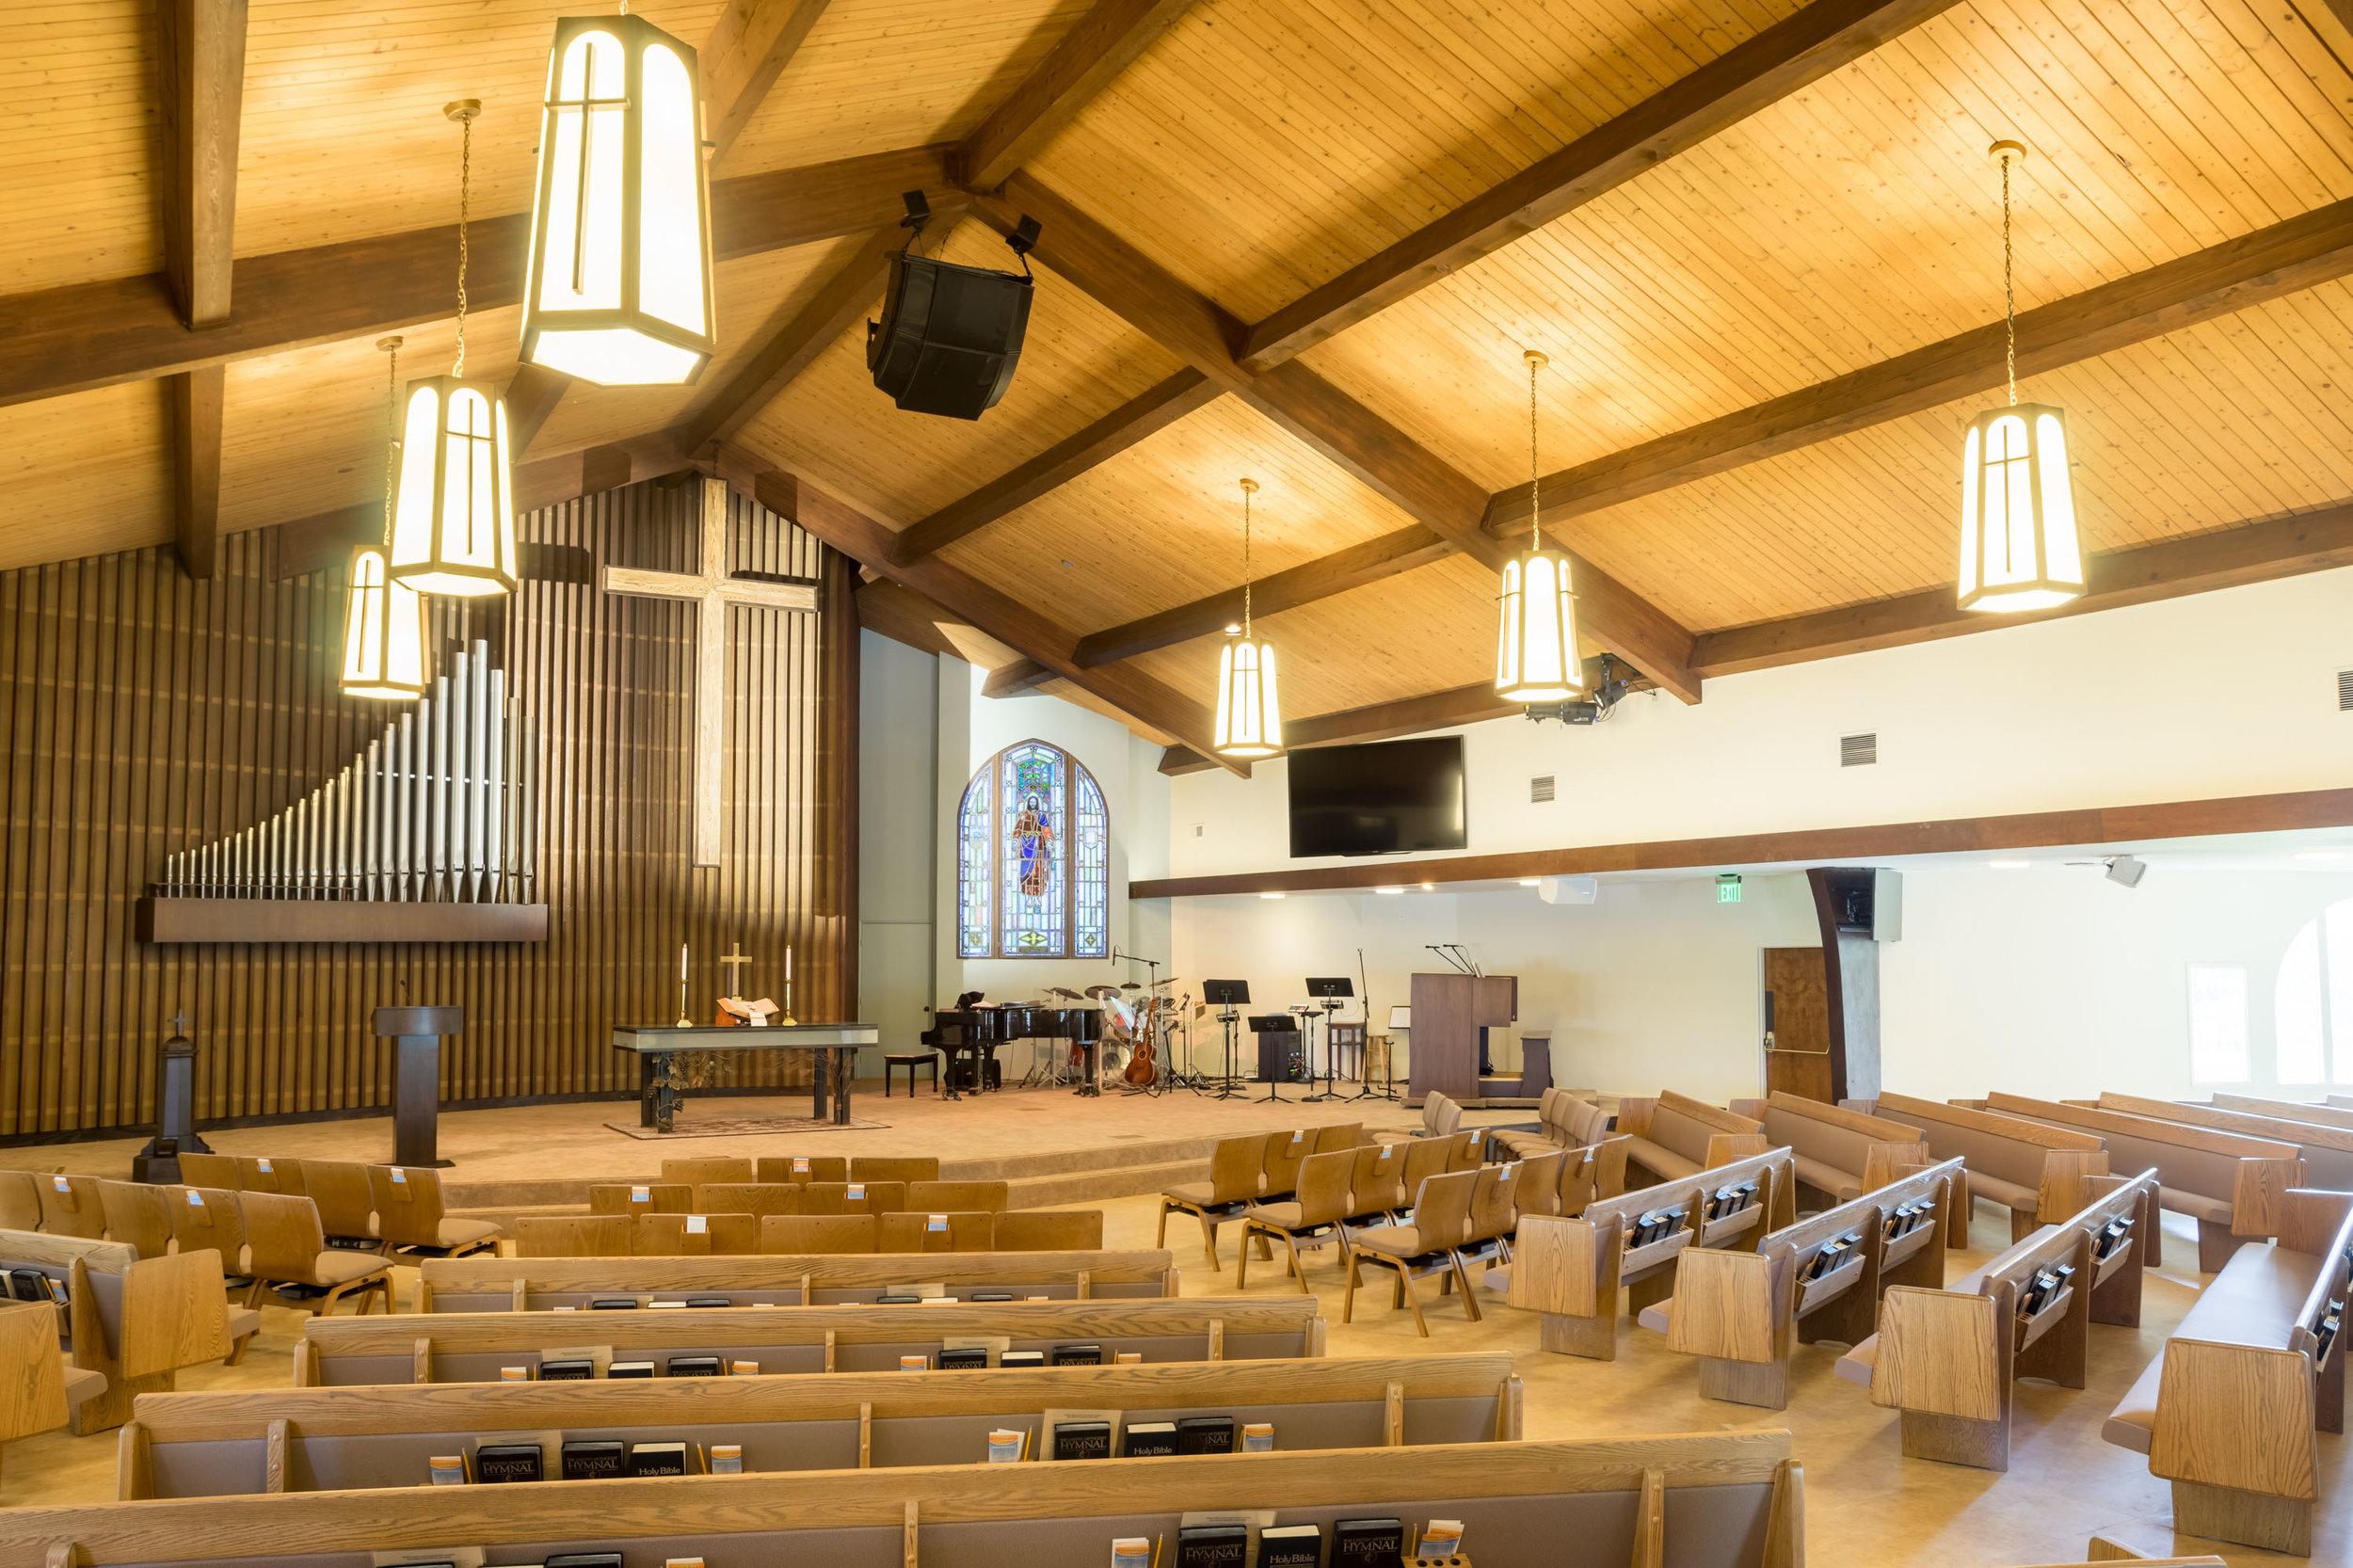 Yorba Linda church-3.jpg